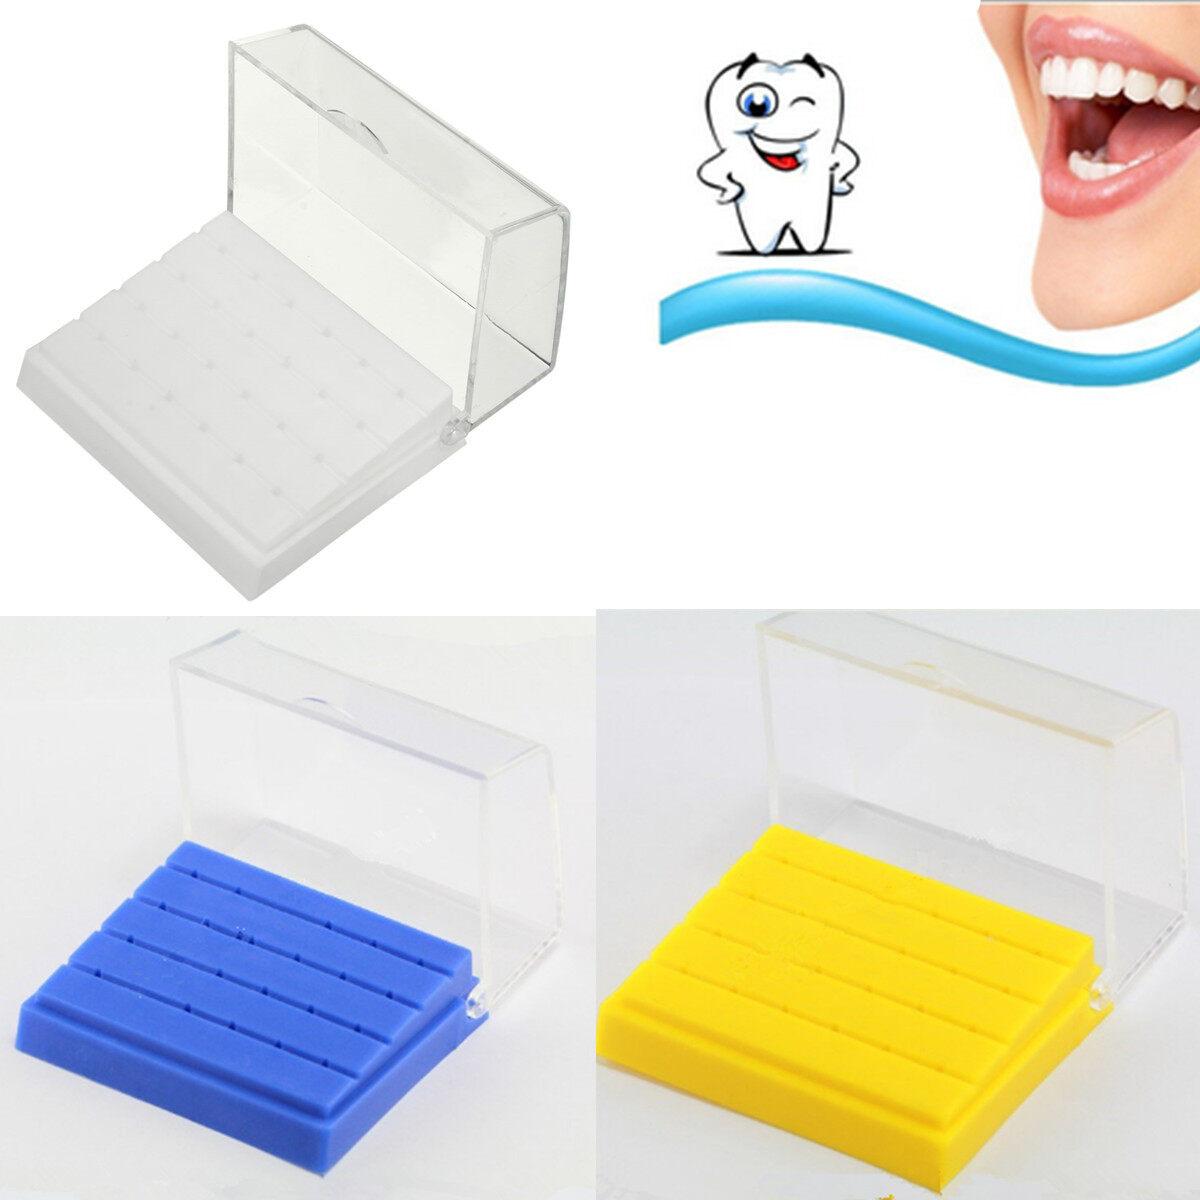 1 x Dental Plastic Bur Holder Burs Block Case Box 24 Holes Burs .